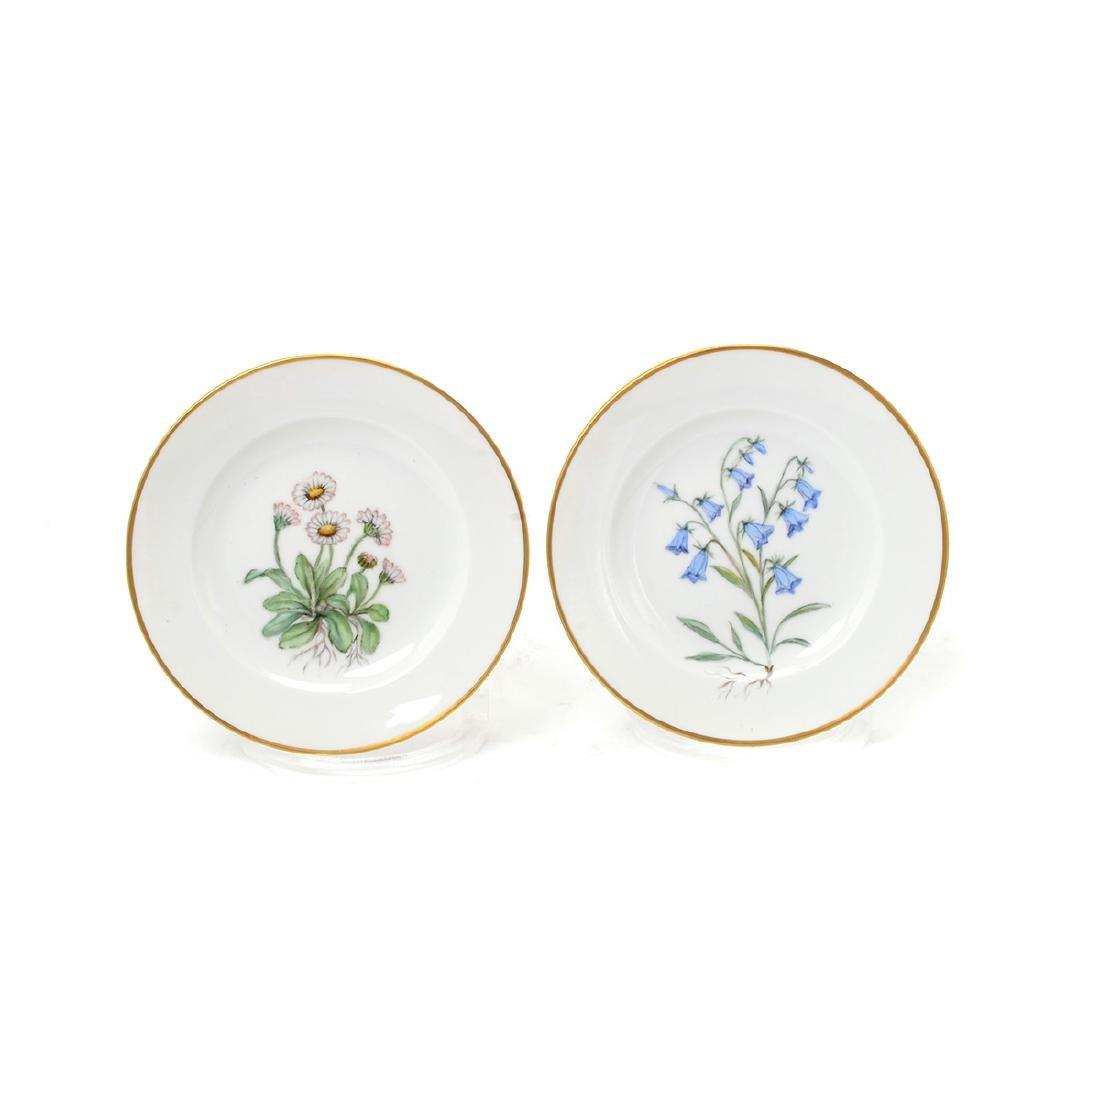 Royal Copenhagen Porcelain Serving and Table Articles - 7